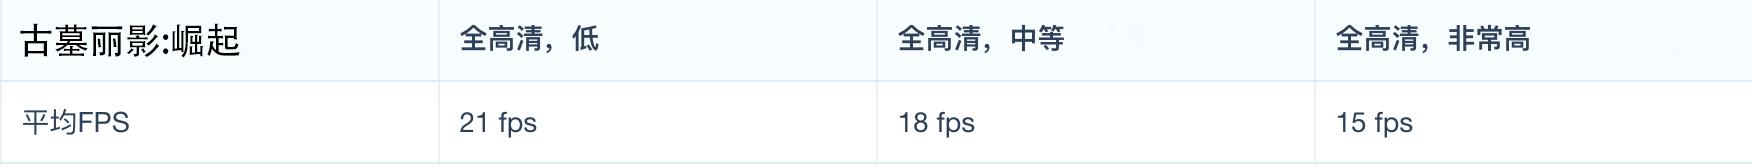 HP 惠普 畅游人 Pavilion 15 评测